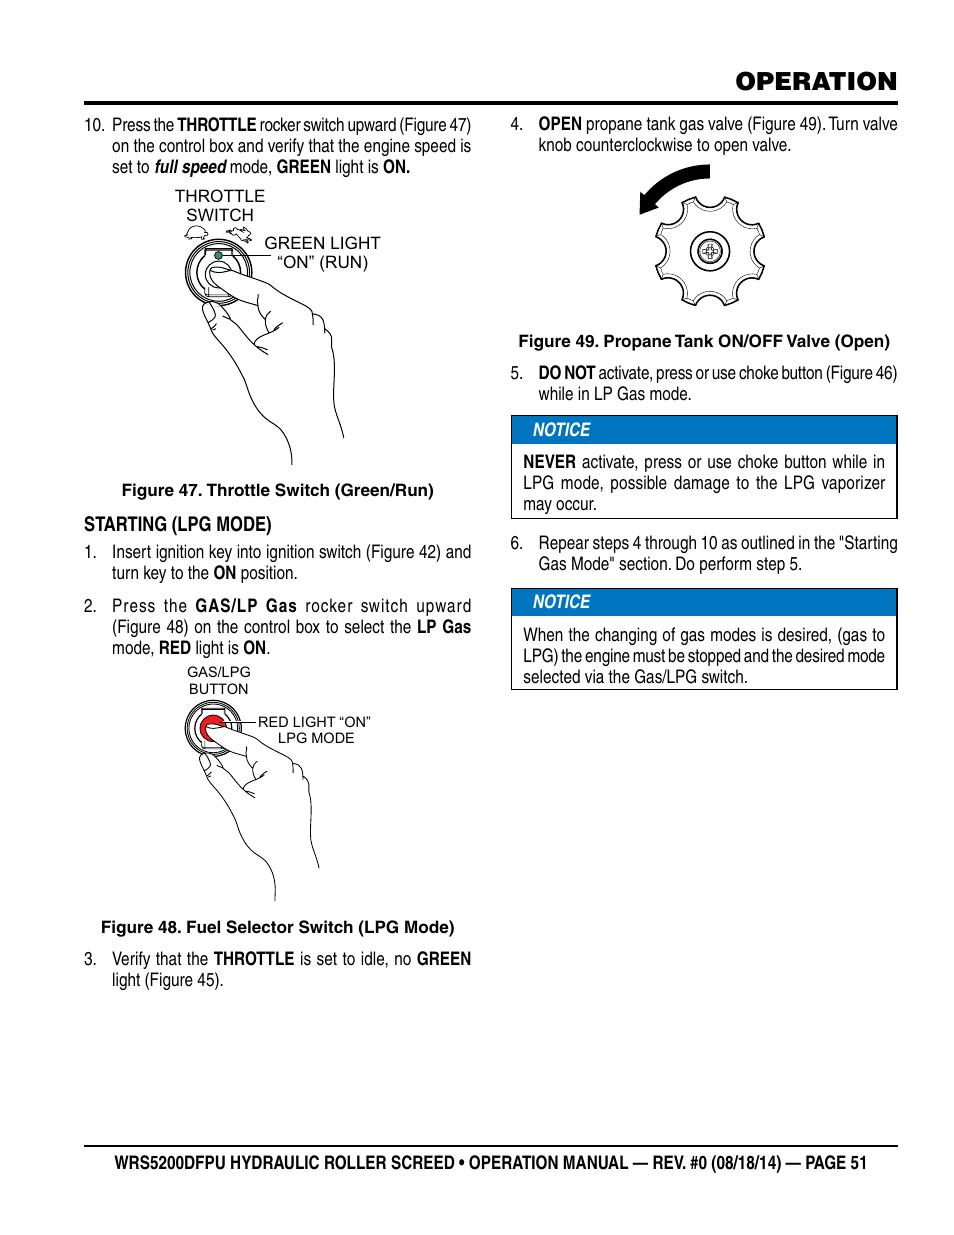 Operation   Multiquip WRS5200DFPU (KUBOTA WG972-GL-E3 DUAL FUEL) User Manual